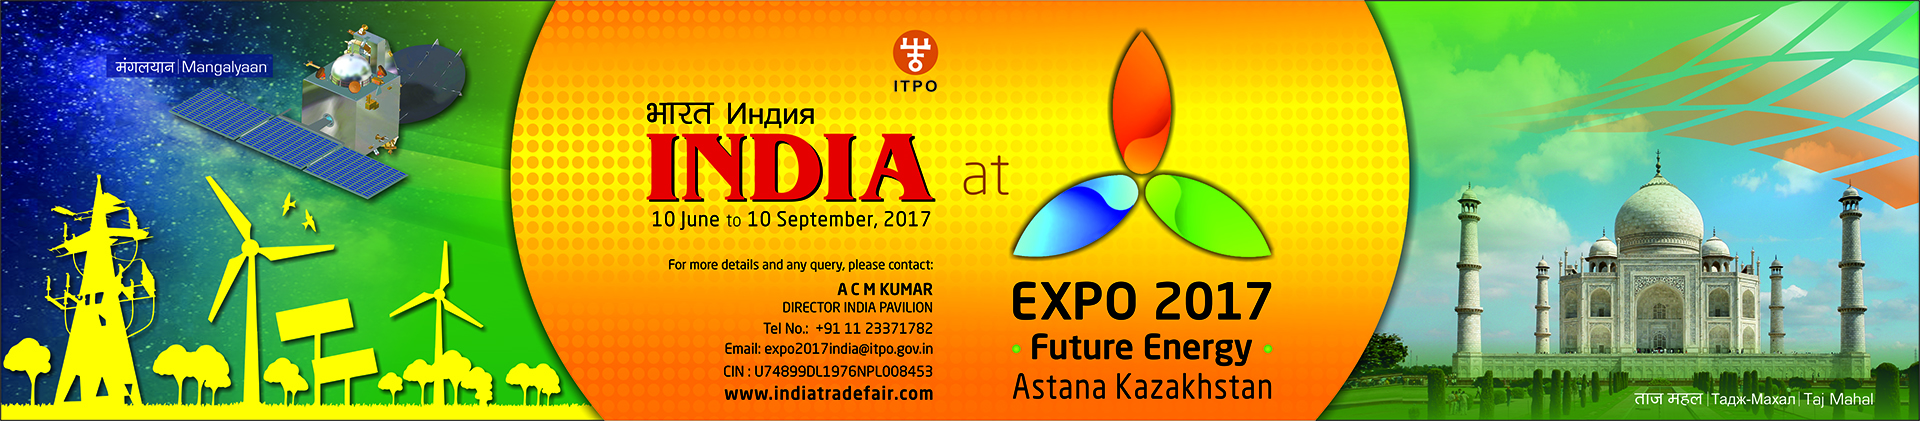 India Trade Promotion Organisation (ITPO)